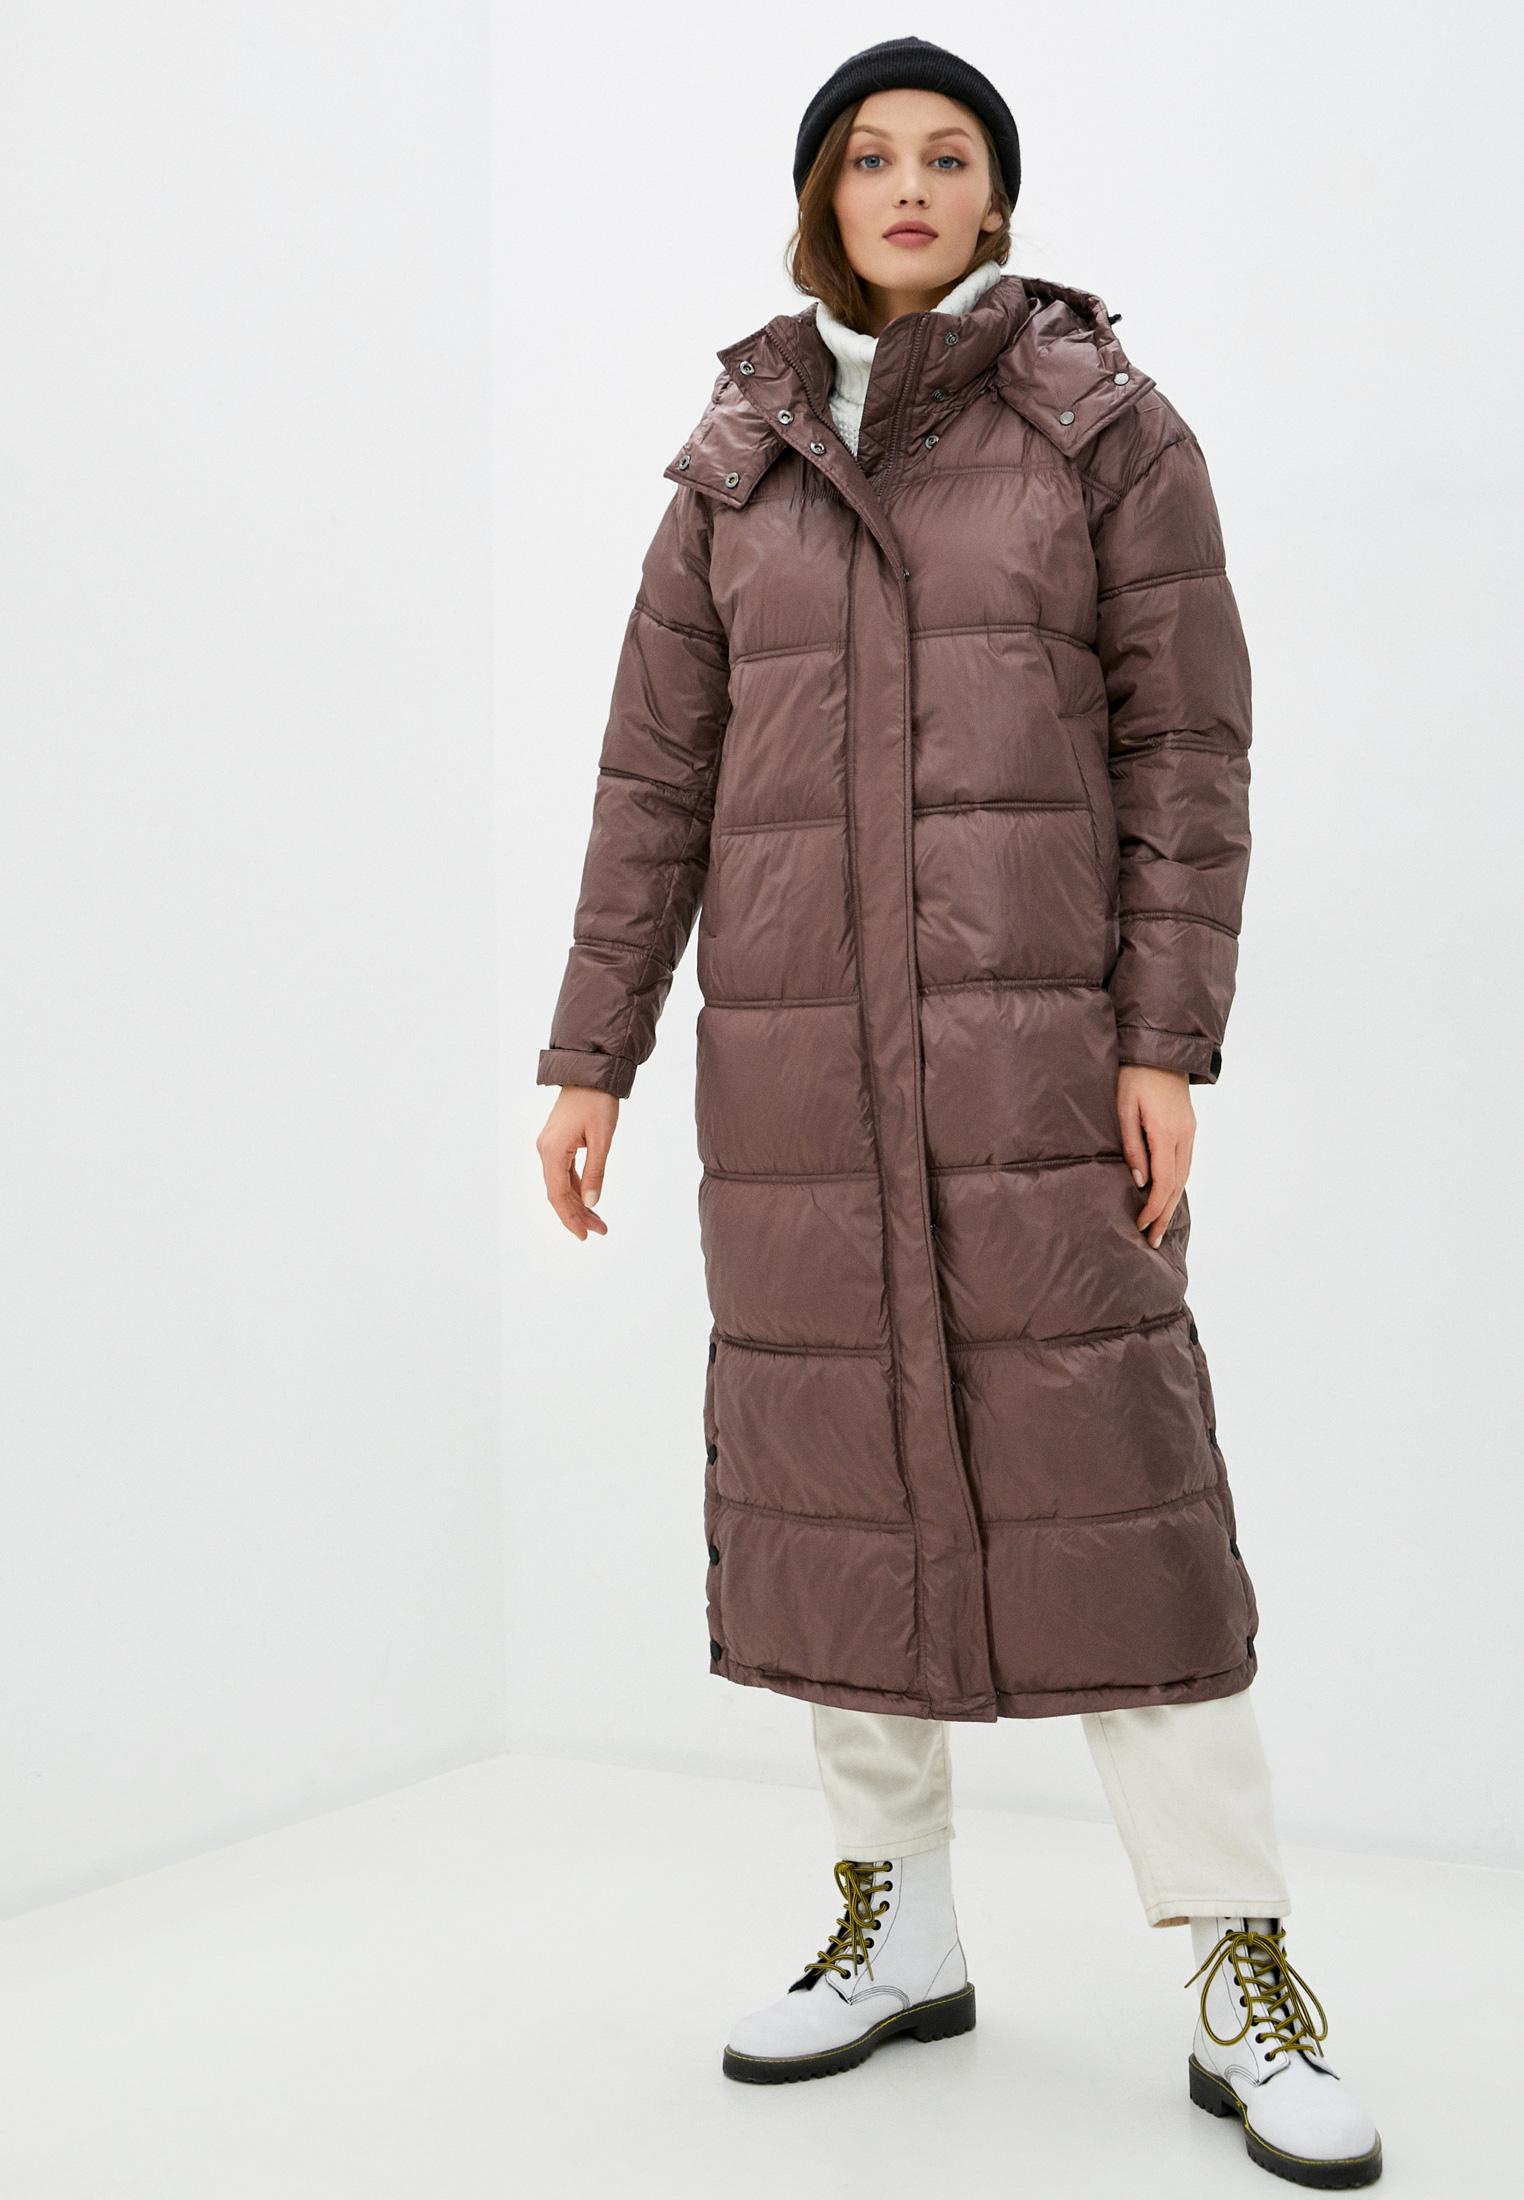 Куртка Baon (Баон) Куртка утепленная Baon